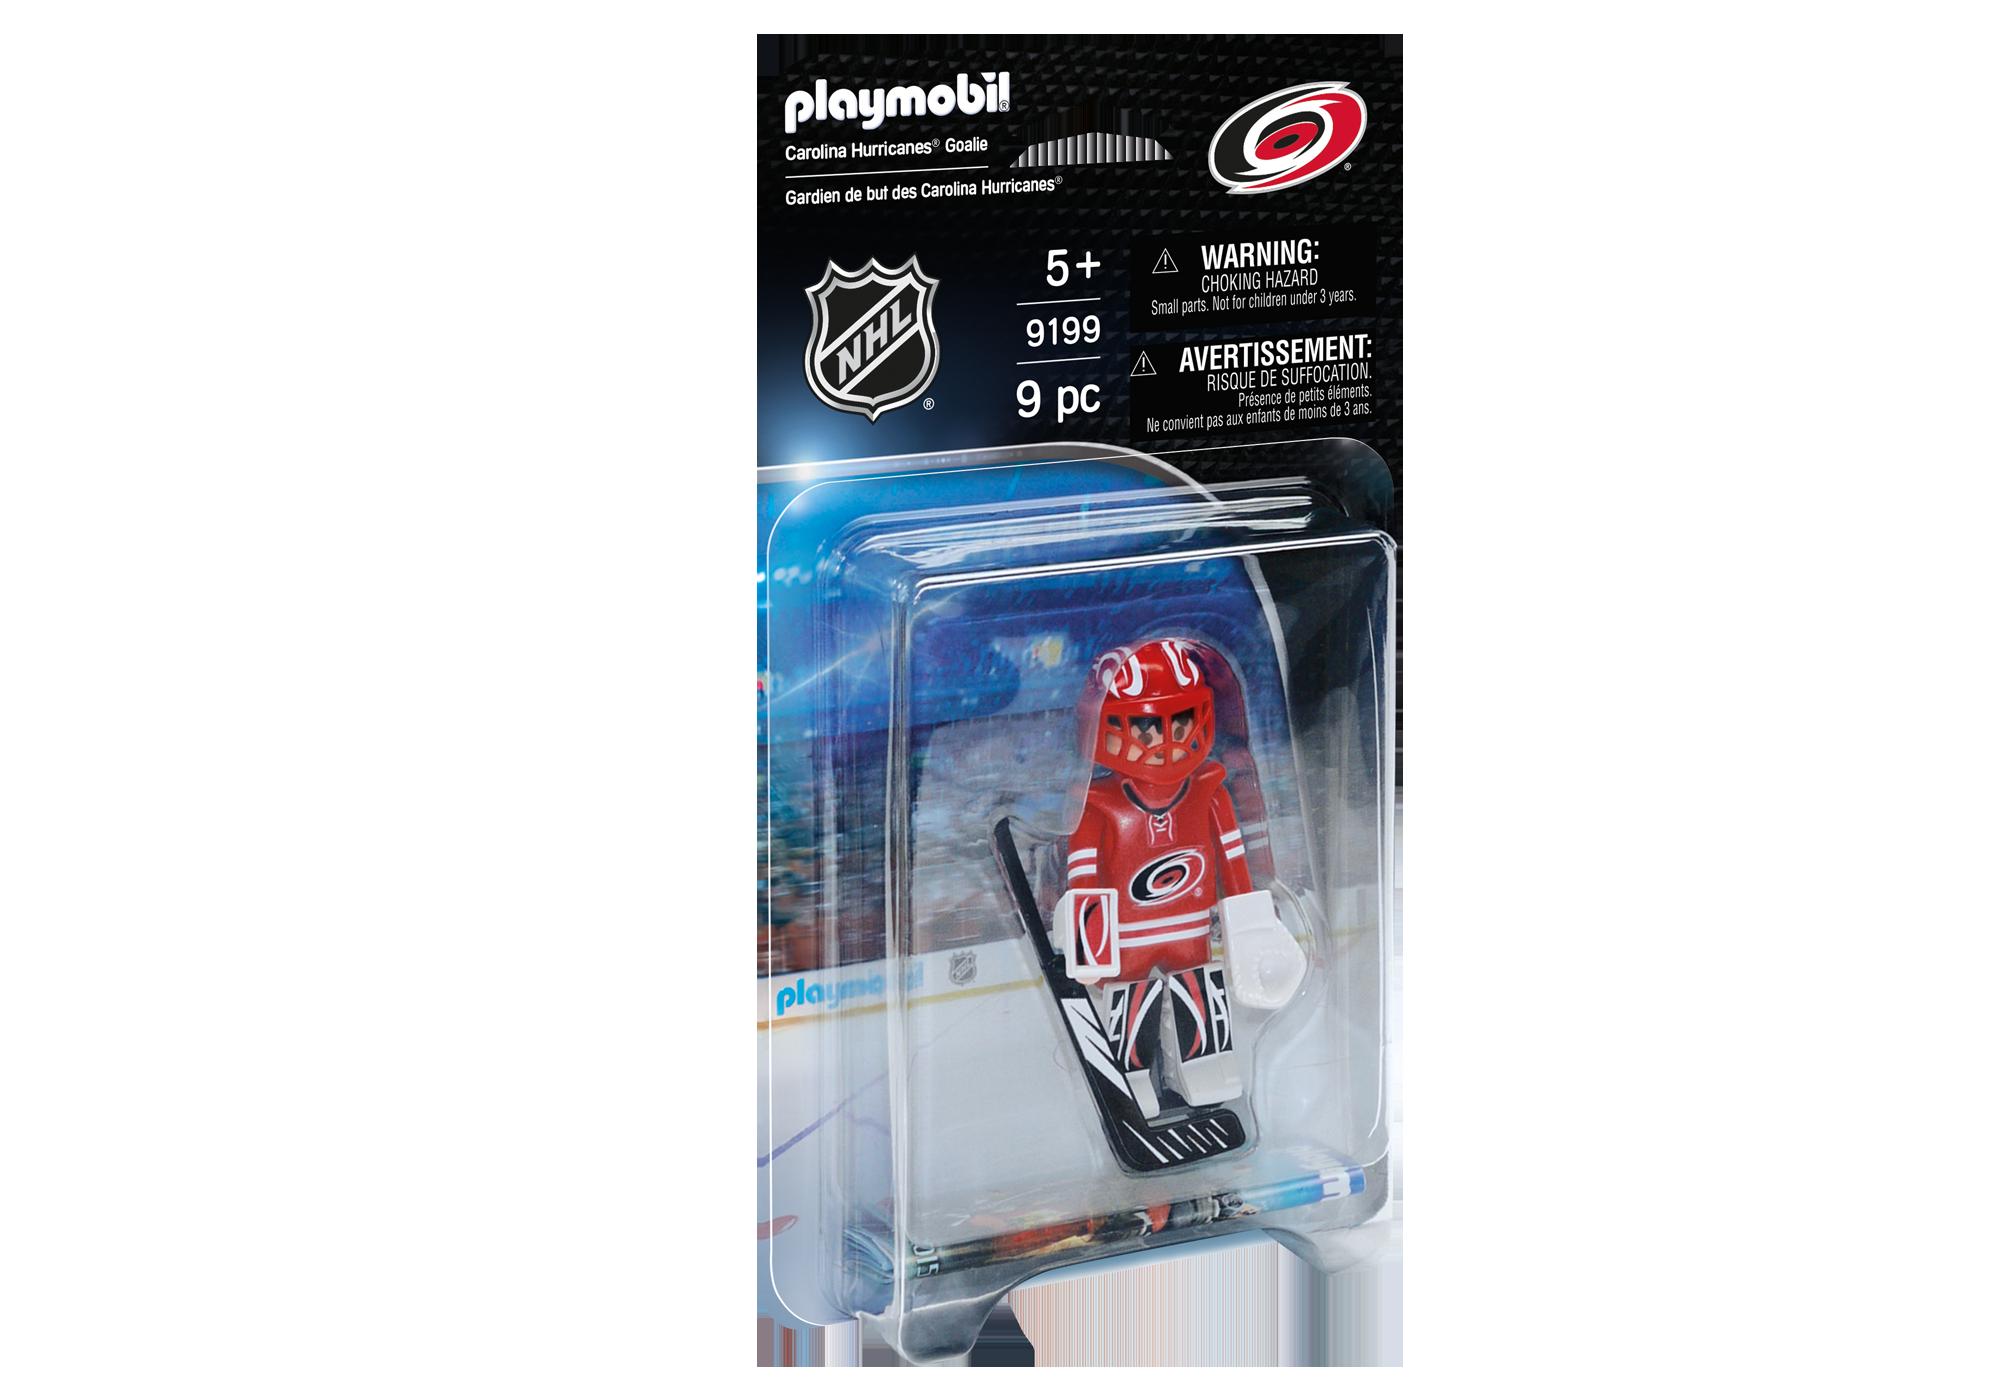 http://media.playmobil.com/i/playmobil/9199_product_box_front/NHL™ Carolina Hurricanes™ Goalie